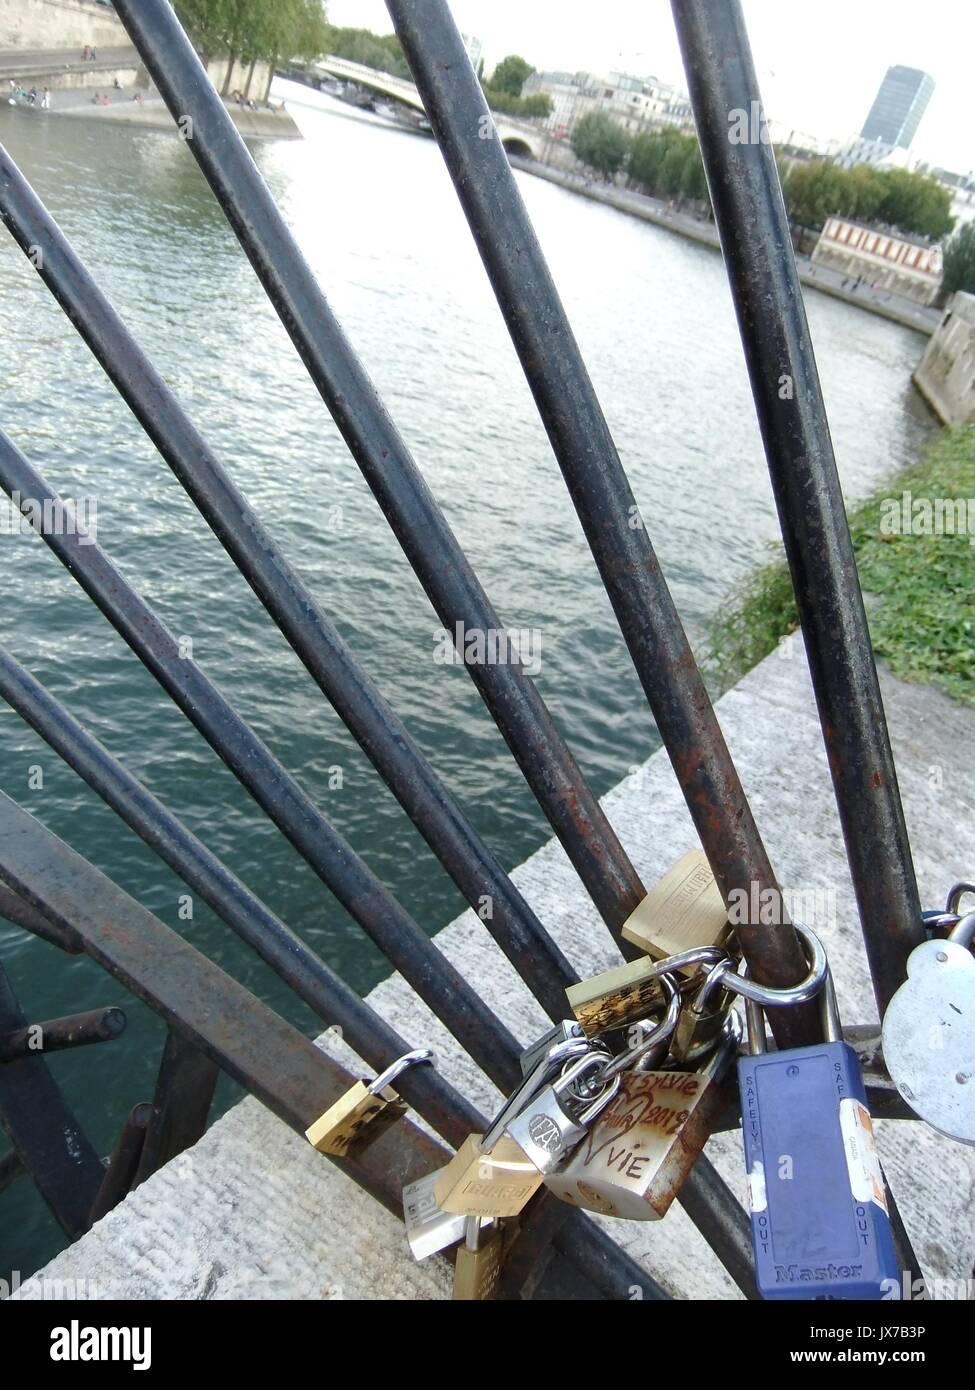 Love Locks on the Pont des Arts in Paris - Stock Image